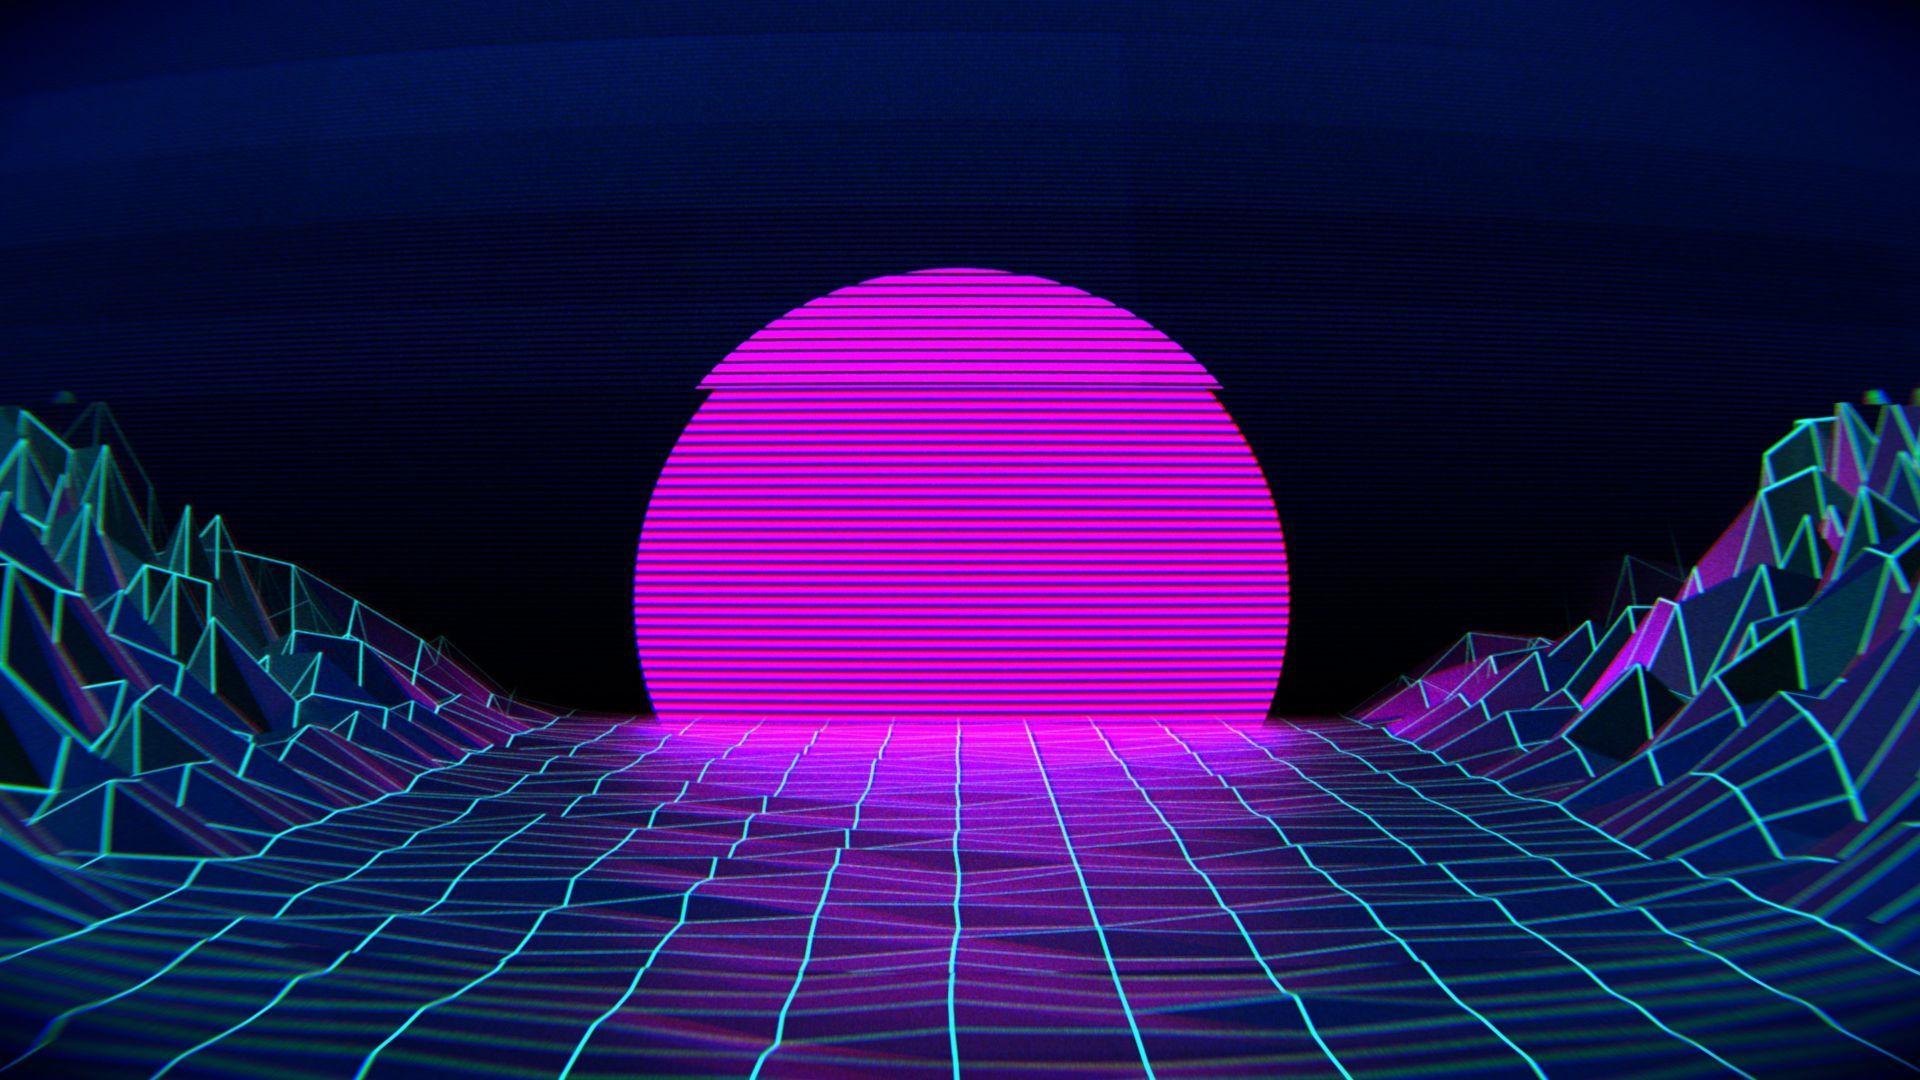 4k Vaporwave Wallpaper In 1920x1080 Resolution In 2020 Vaporwave Wallpaper Iphone Wallpaper Vaporwave Vaporwave